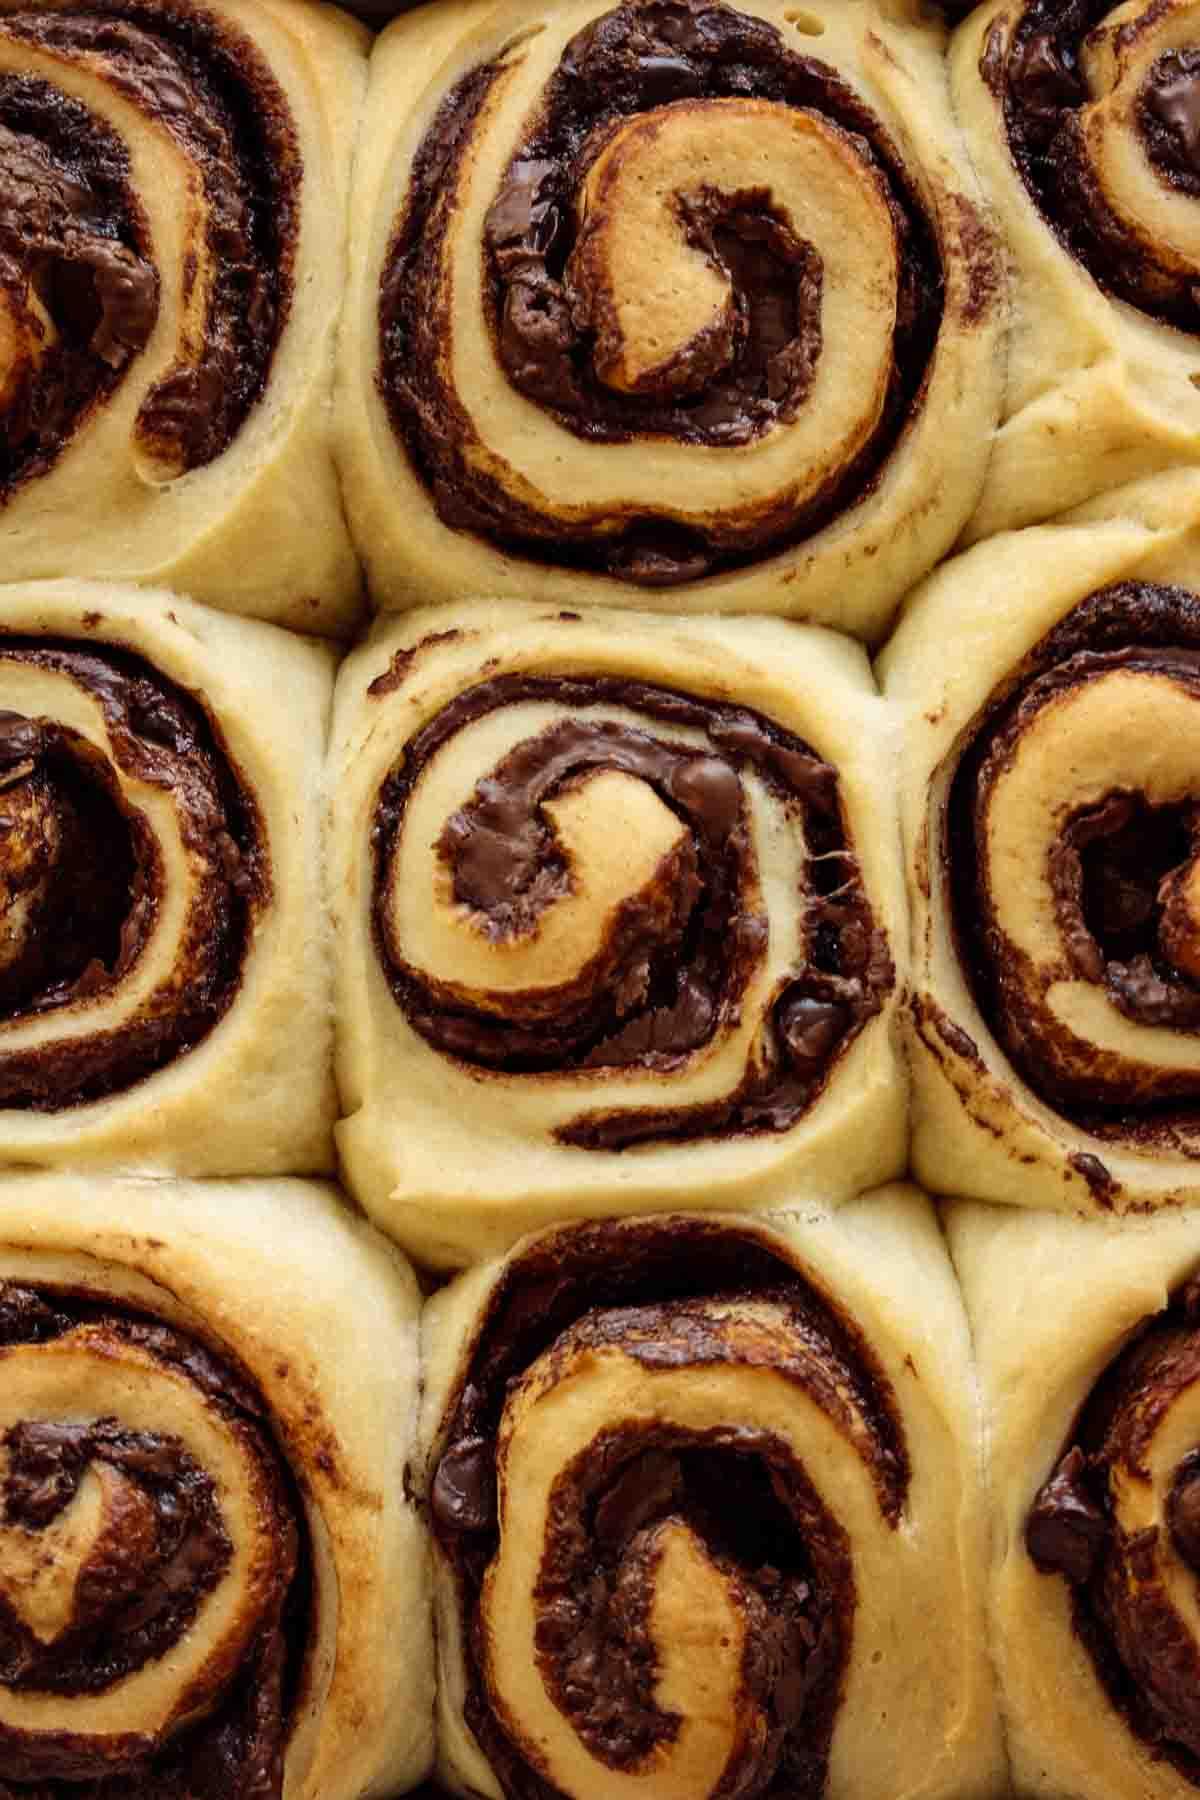 Baked rolls before chocolate glaze.